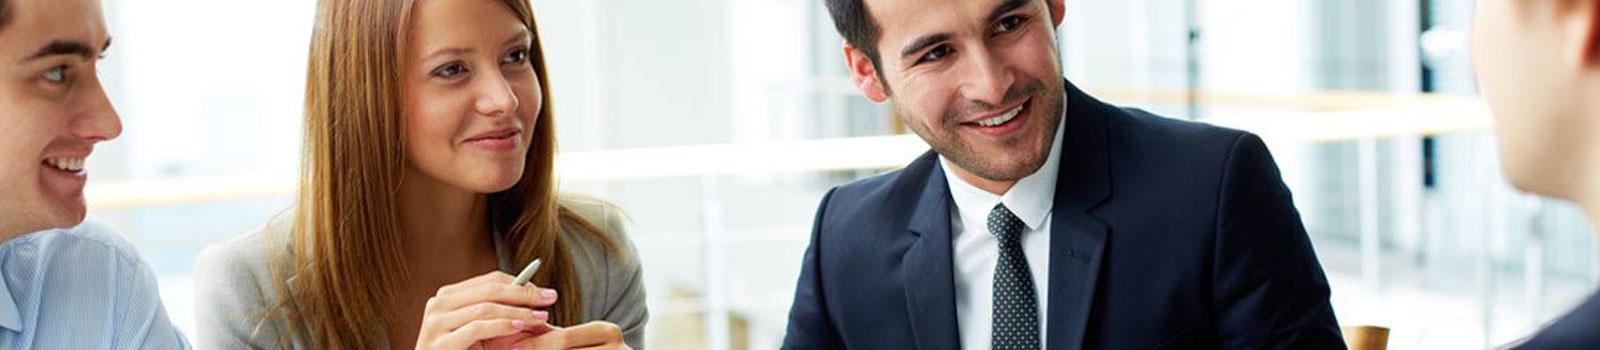 Customer Acquisition & Retention Services